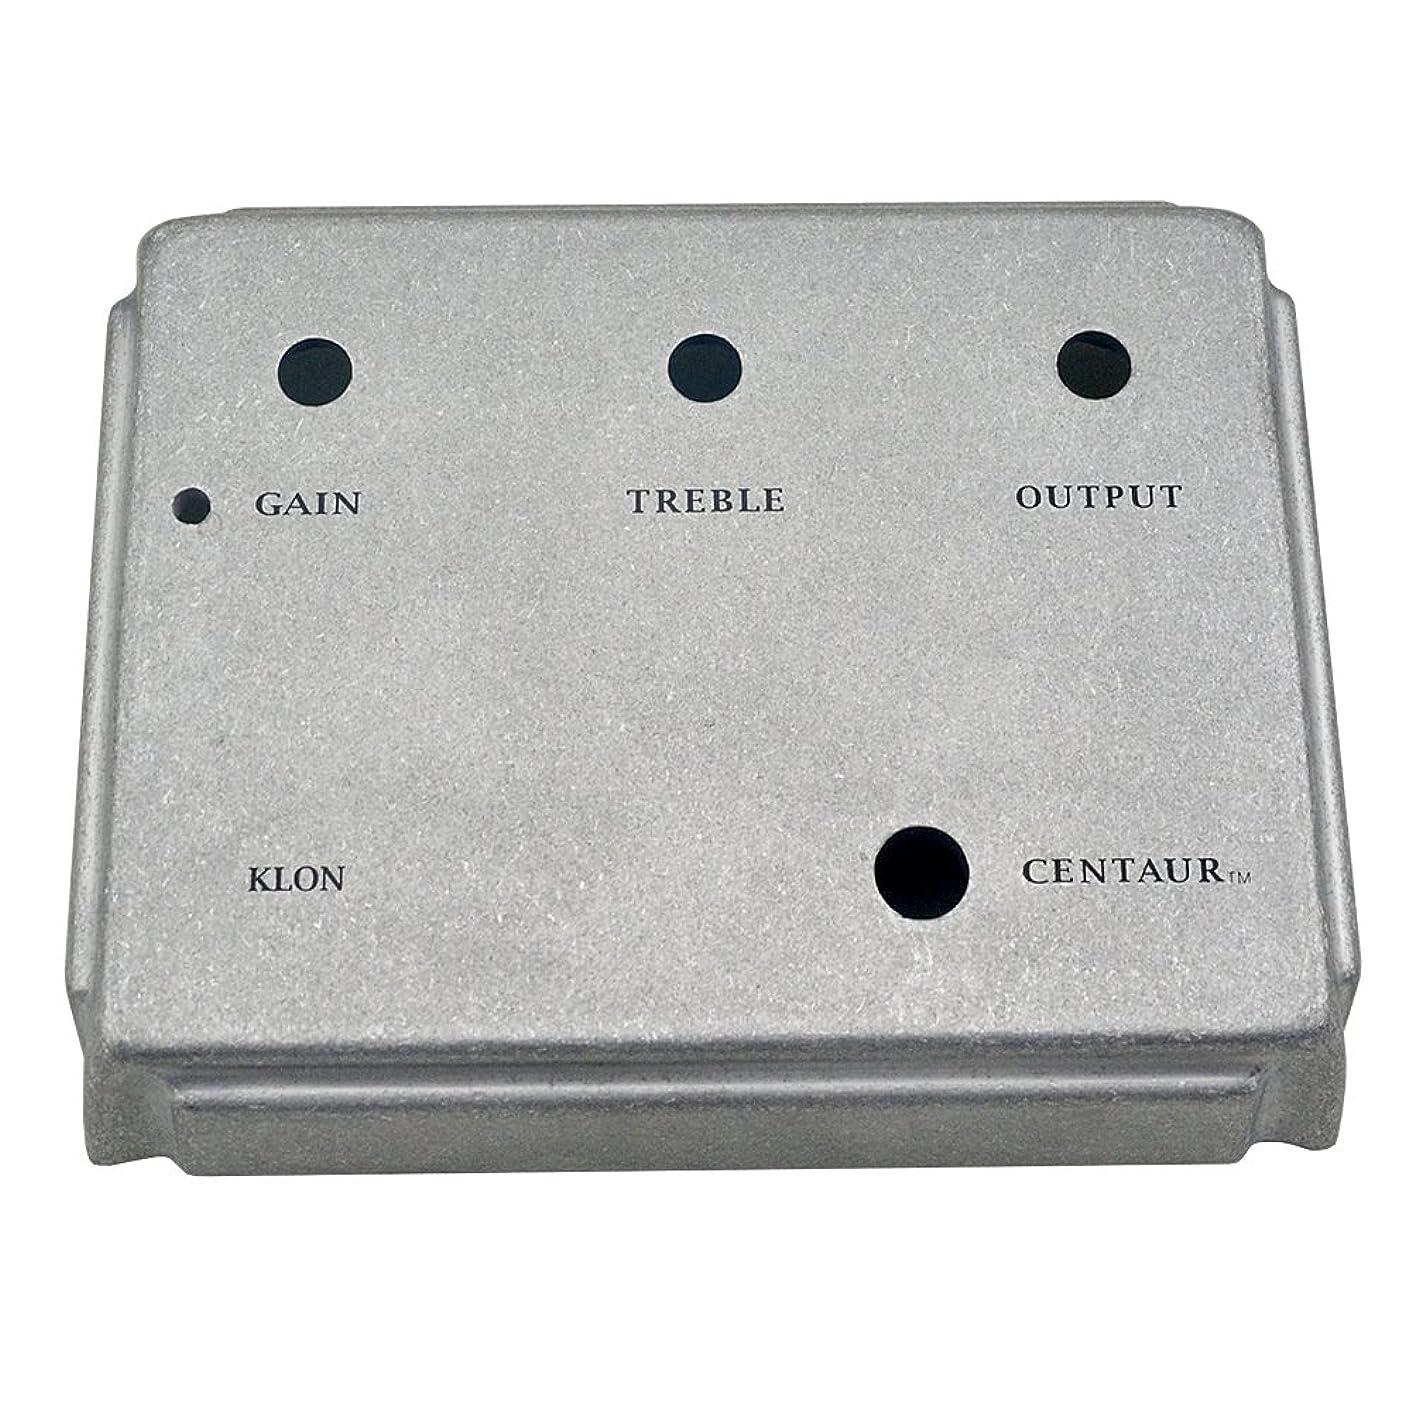 New Diecast Aluminum Overdrive Effects Pedal Project Box Enclosed Case For DIY Klon Centaur Pedal